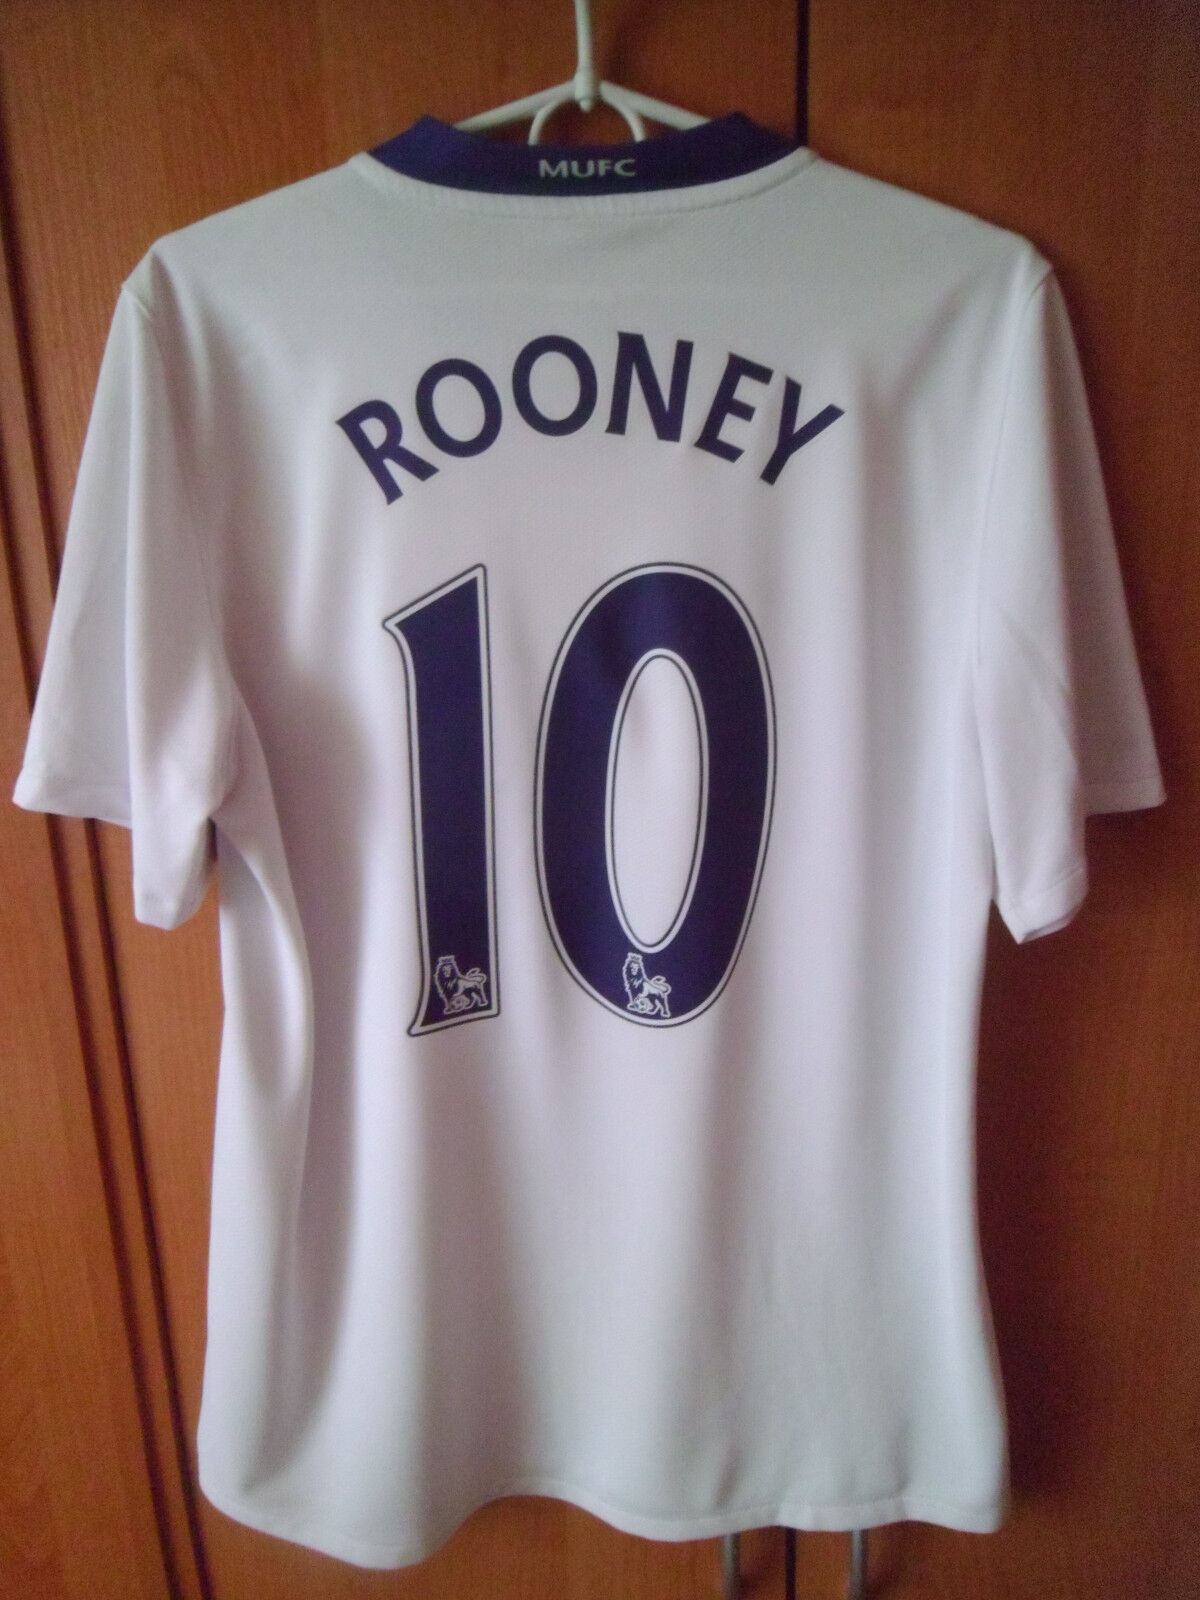 ROONEY   2008-09 Manchester United Away Shirt Jersey Trikot S